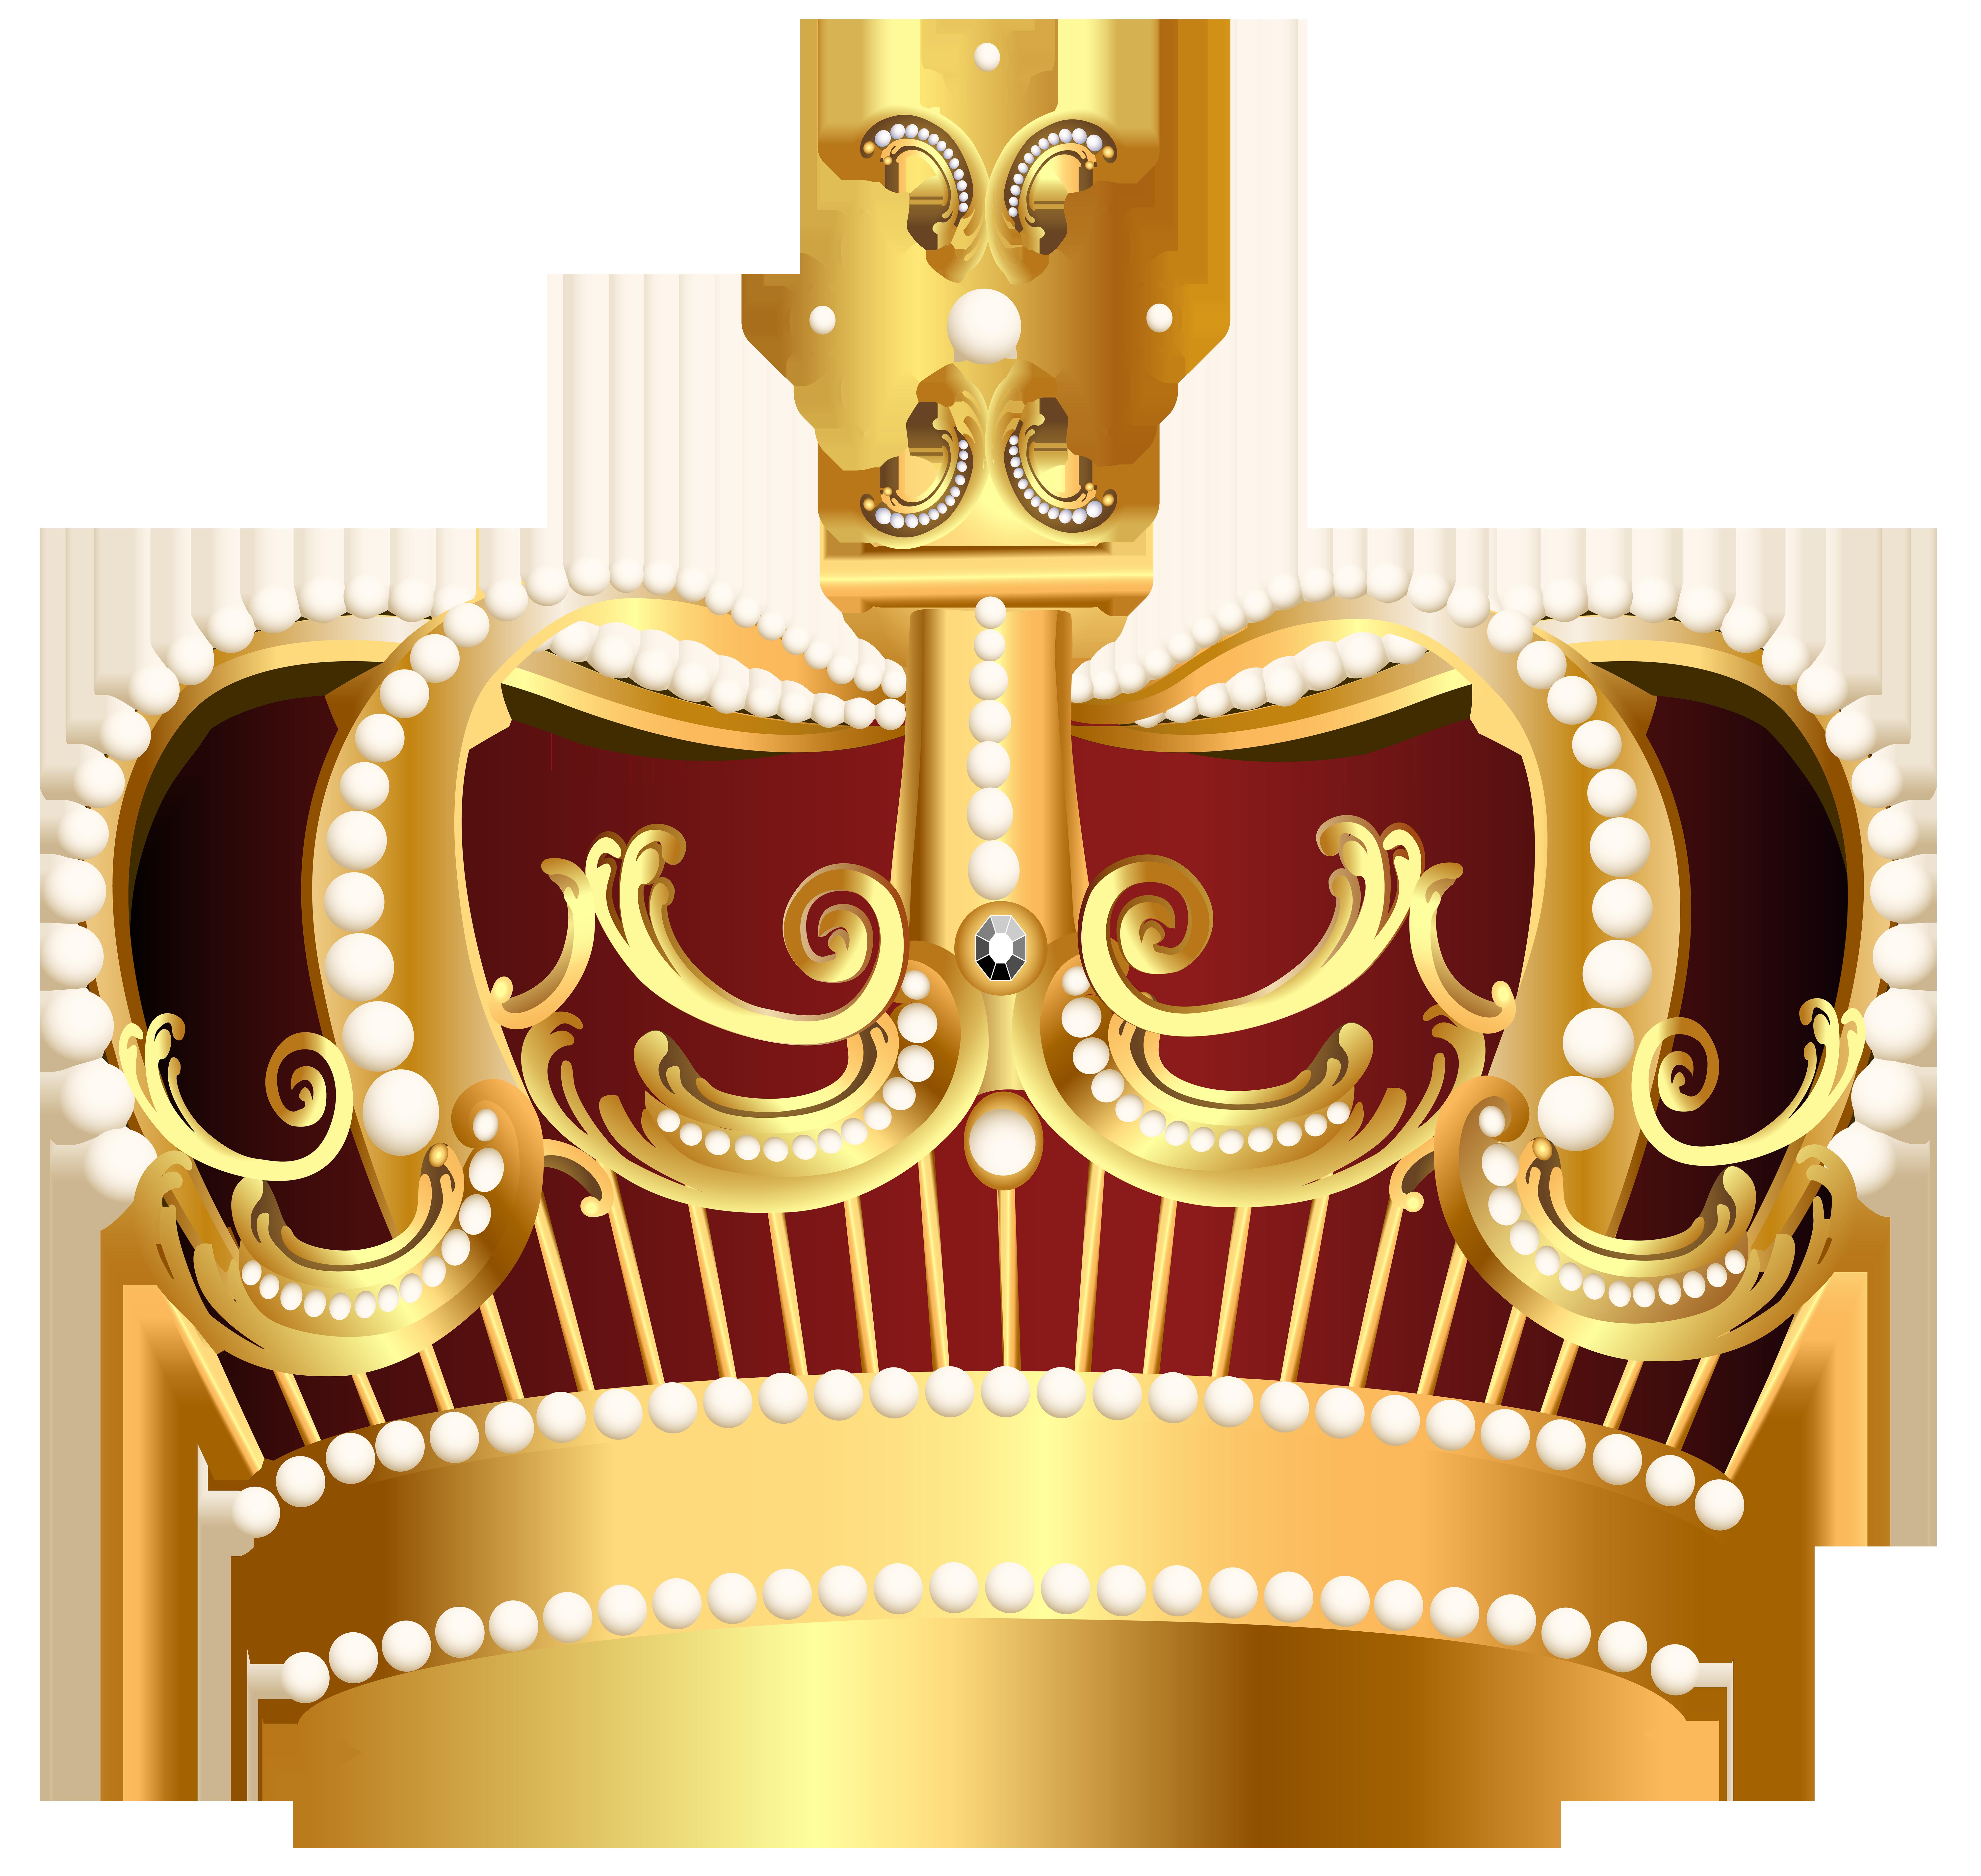 Golden Crown Transparent Png Clip Art Image